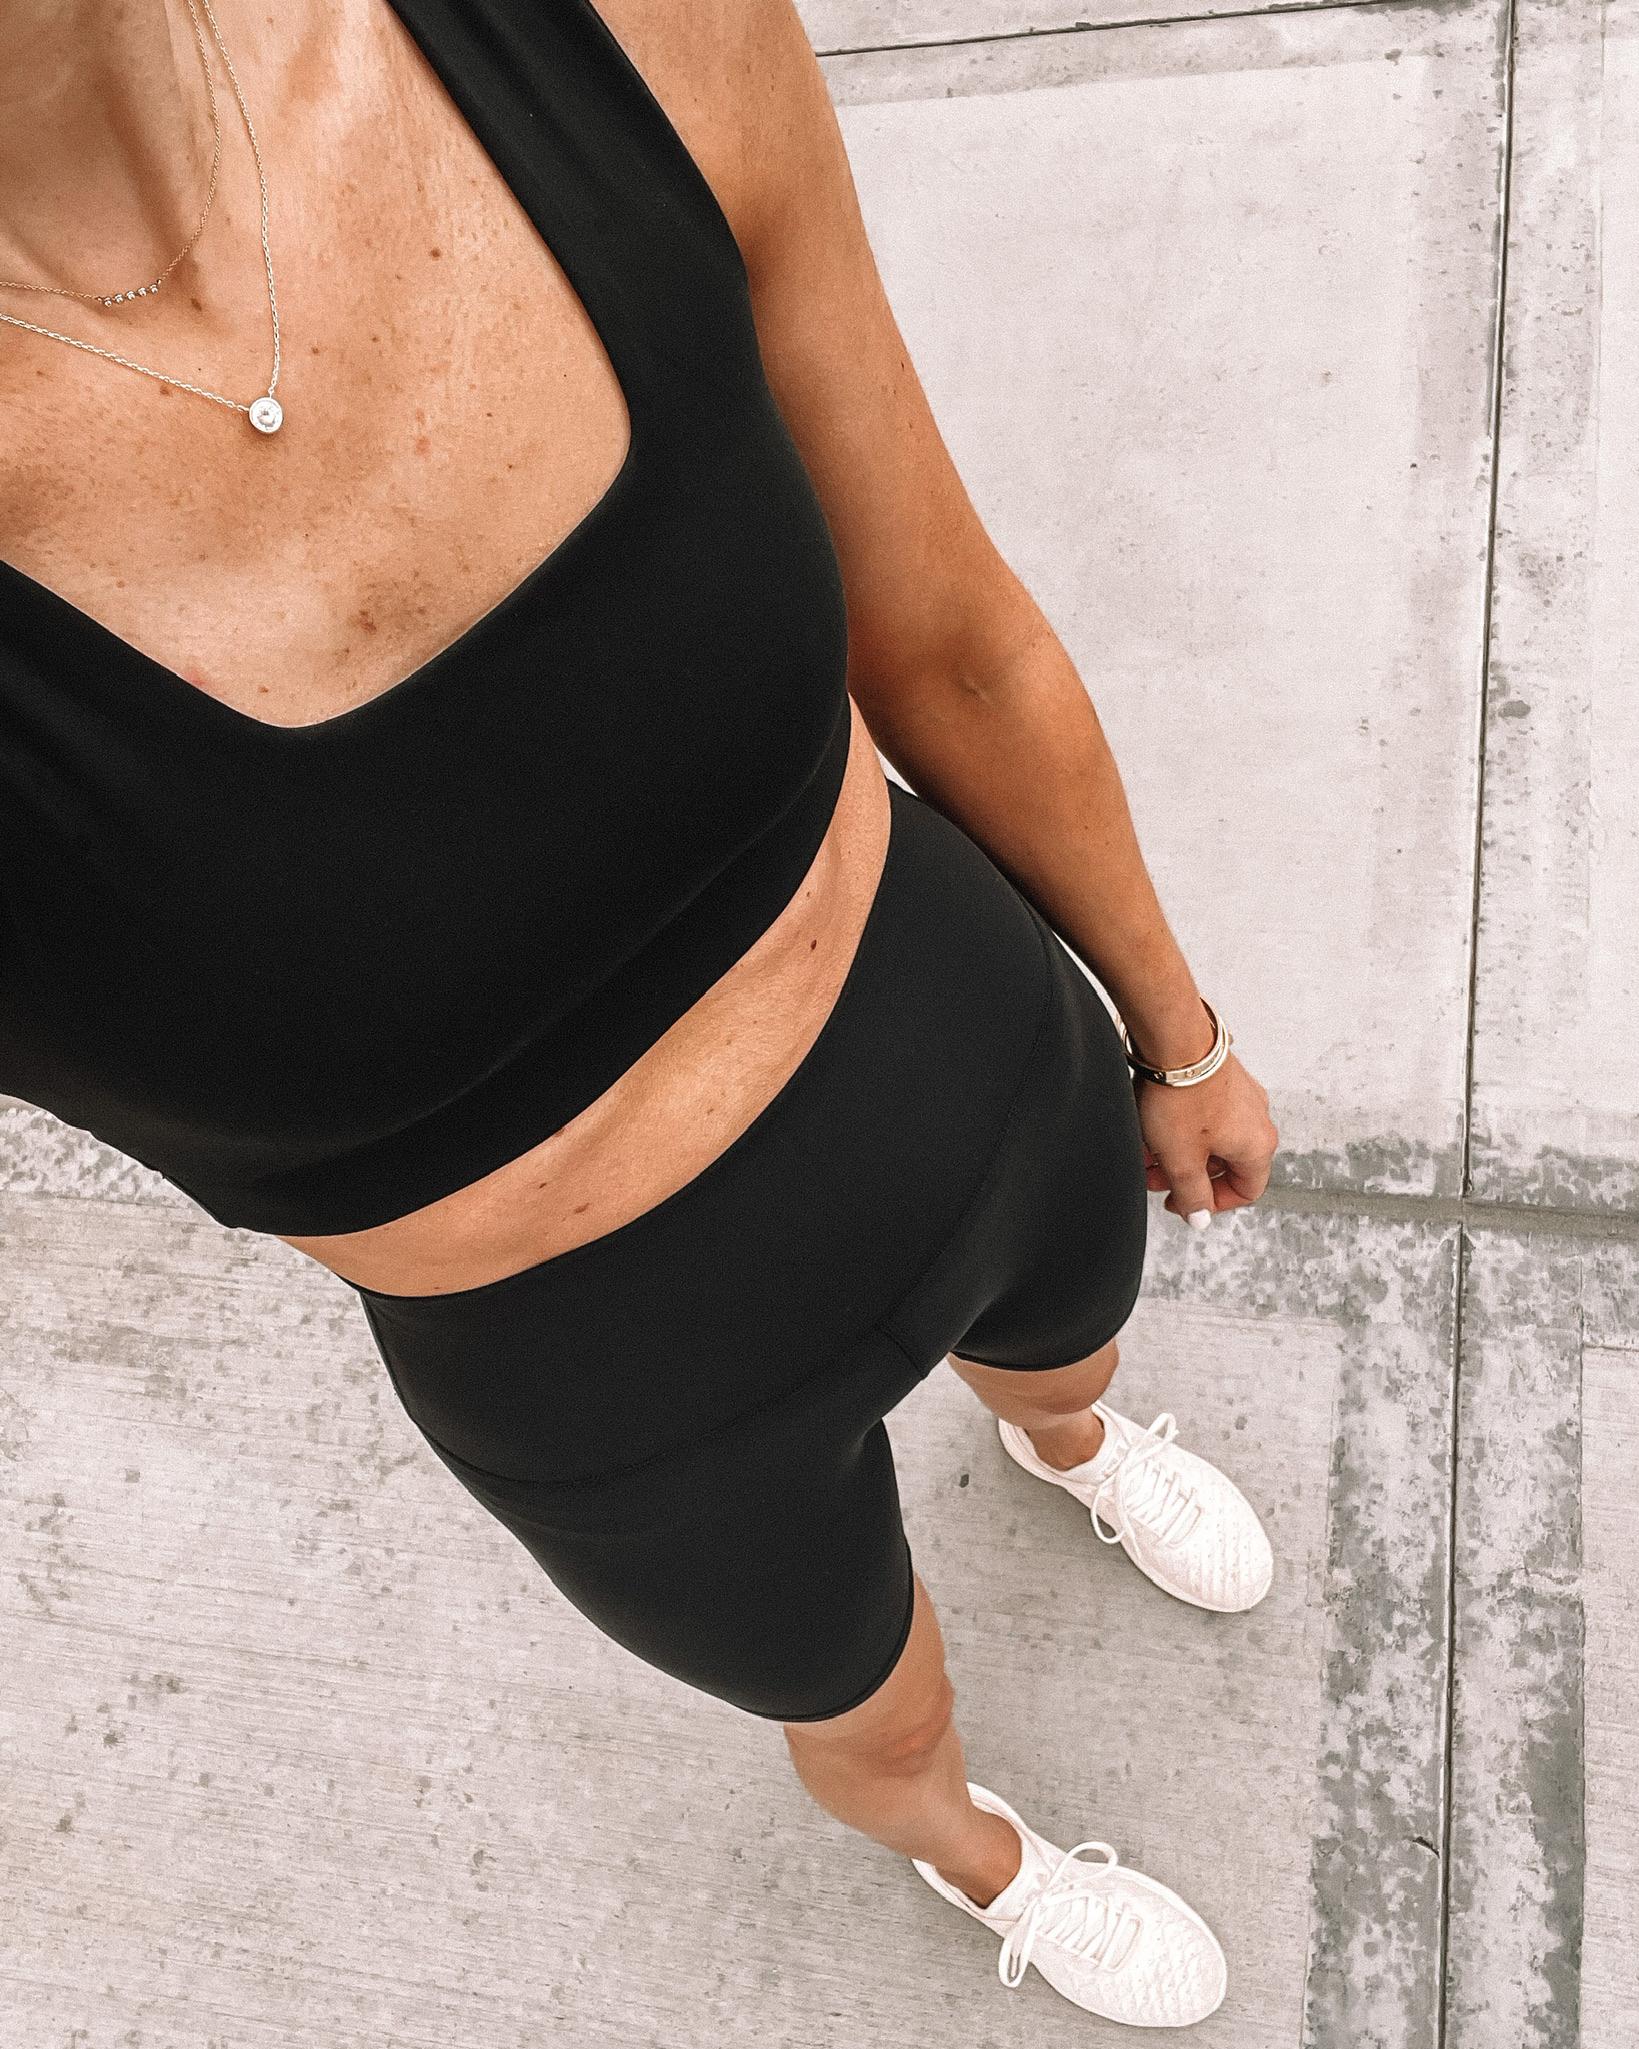 Fashion Jackson Wearing Varley Black Sports Bra lululemon Black Align Biker Shorts APL Sneakers workout outfits for women